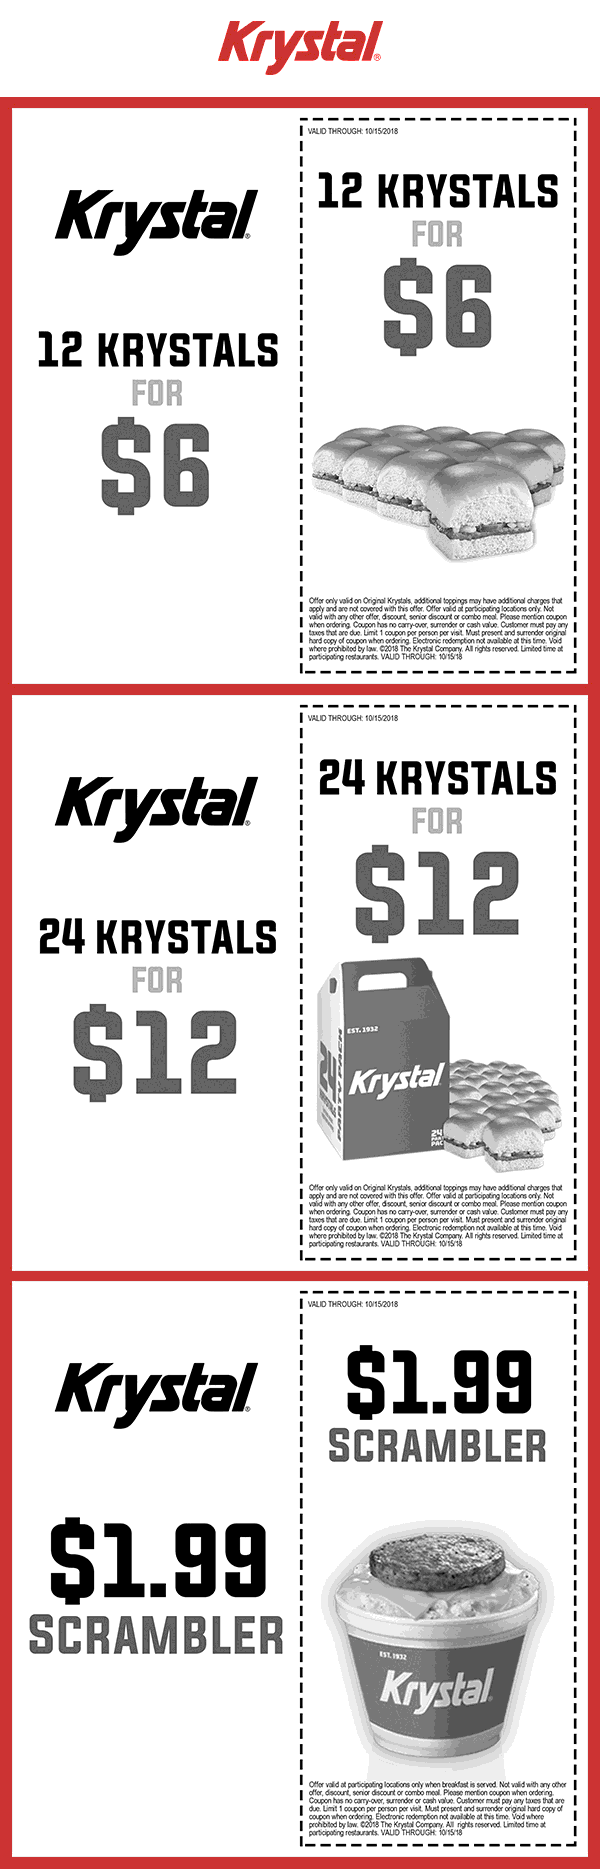 Krystal coupons & promo code for [April 2020]